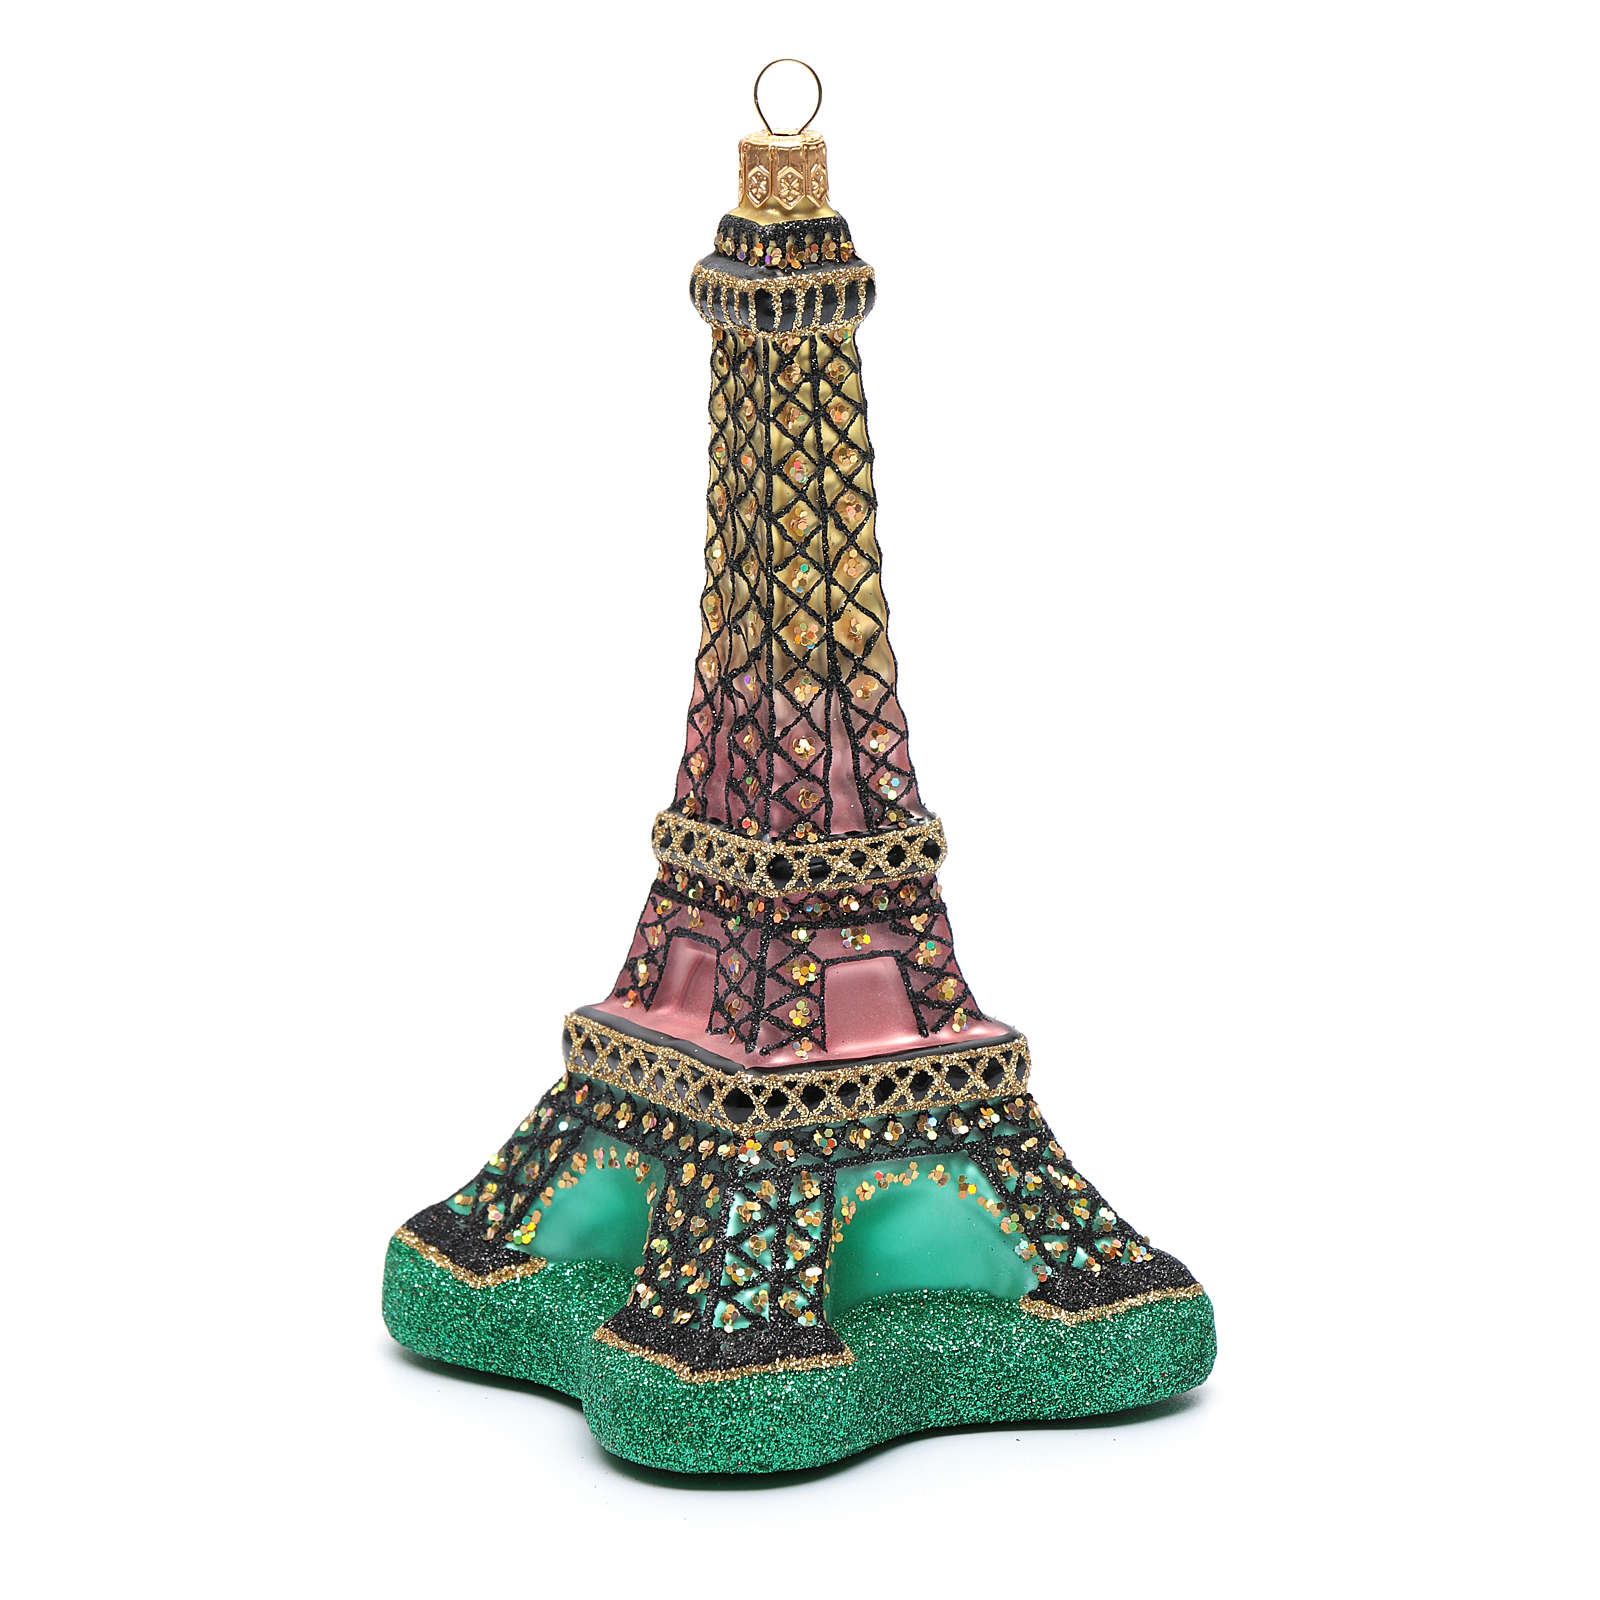 Blown glass Christmas ornament, Eiffel Tower 4